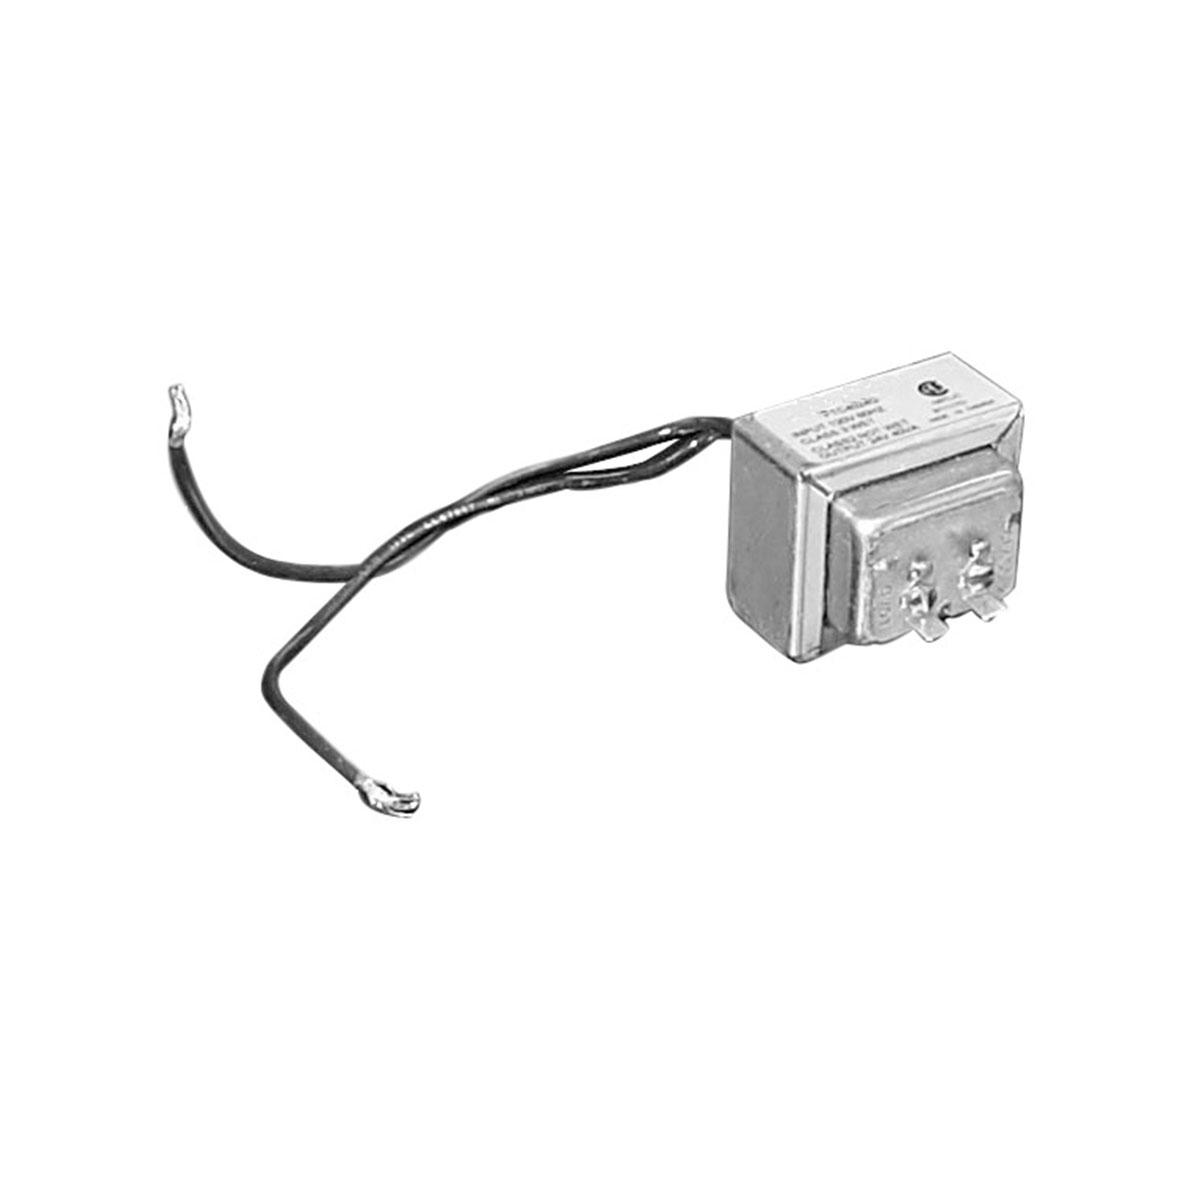 hight resolution of wire in transformer 1 power supplies rci ead